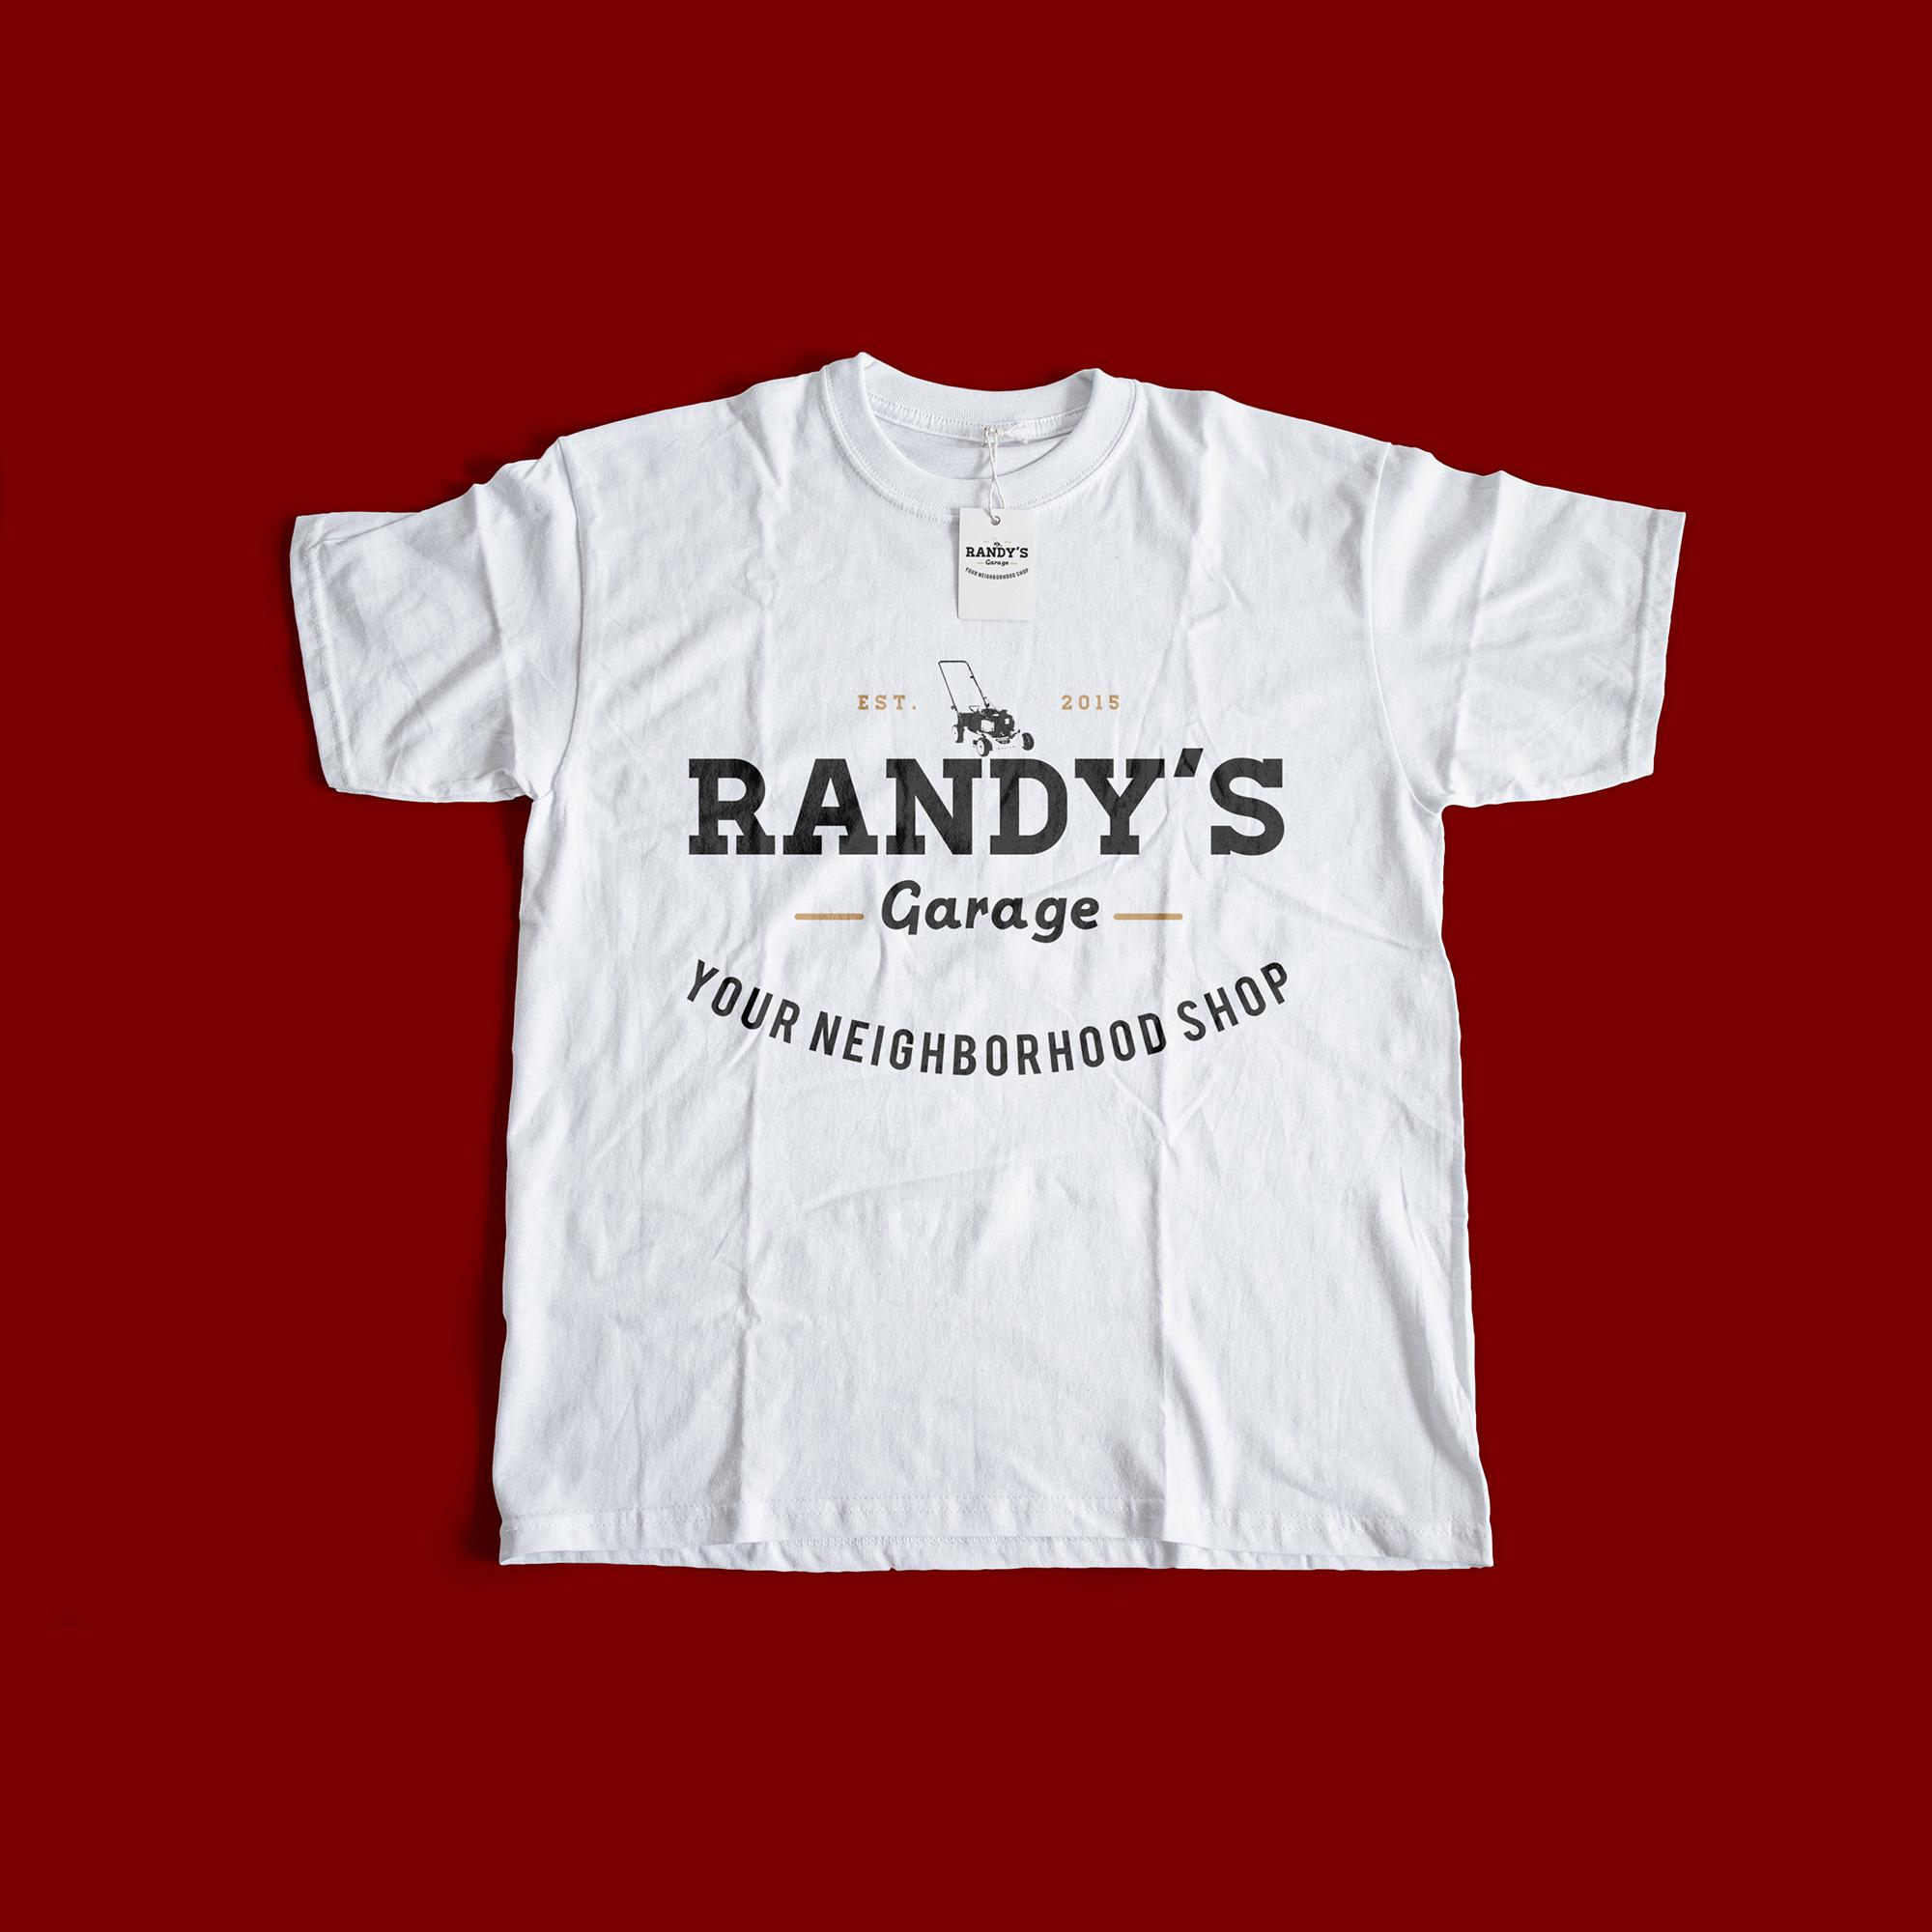 Tshirt Mockup of Randy's Garage logo design by Geena Matuson @geenamatuson #thegirlmirage